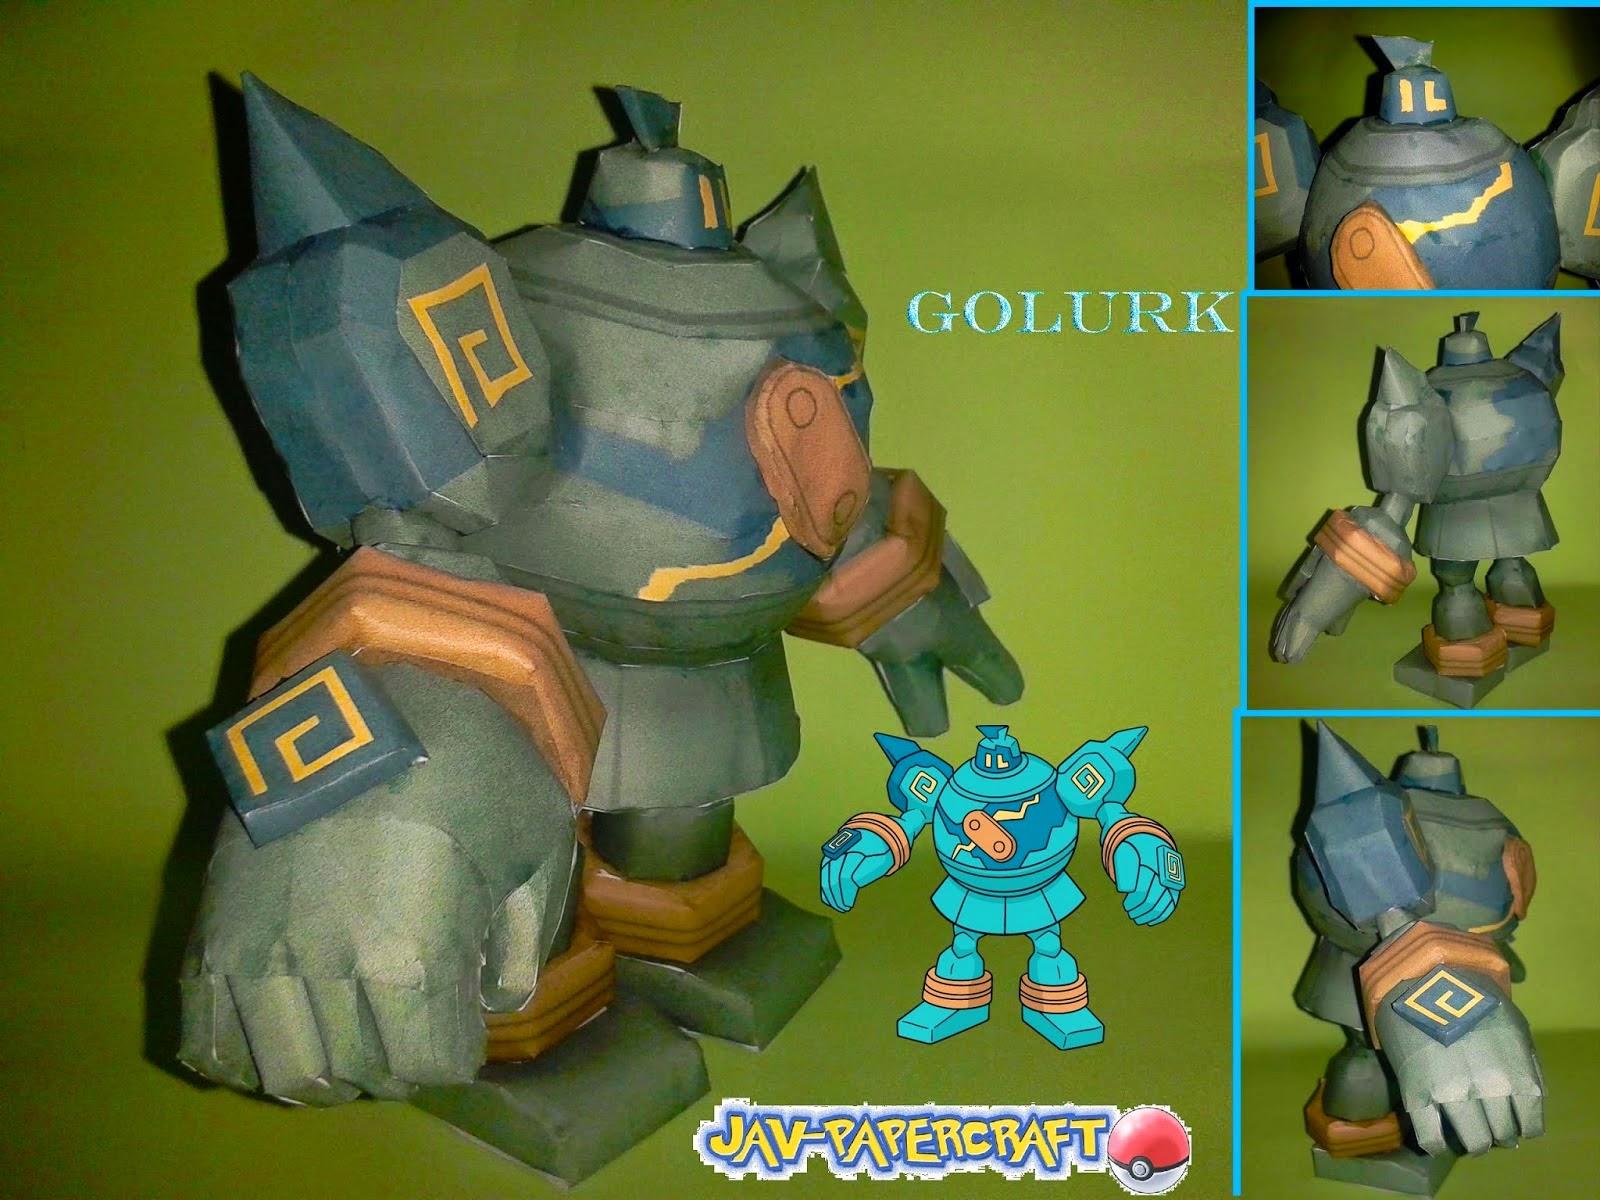 Pokemon Golurk Papercraft Model